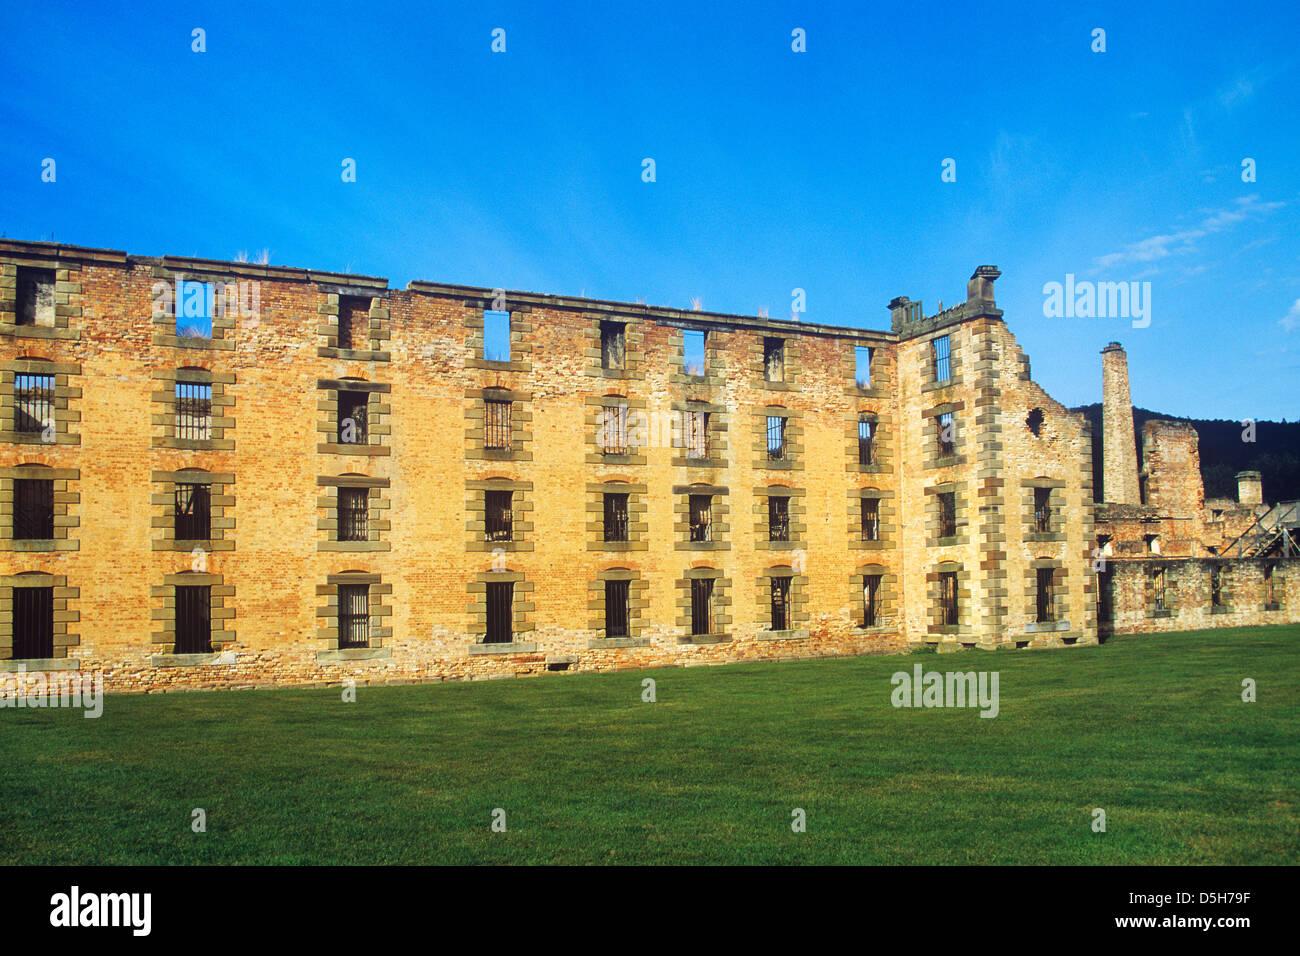 Australia, Tasmania, Tasman Peninsula, Port Arthur Historic Convict Site, view of the convict Penitentiary - Stock Image